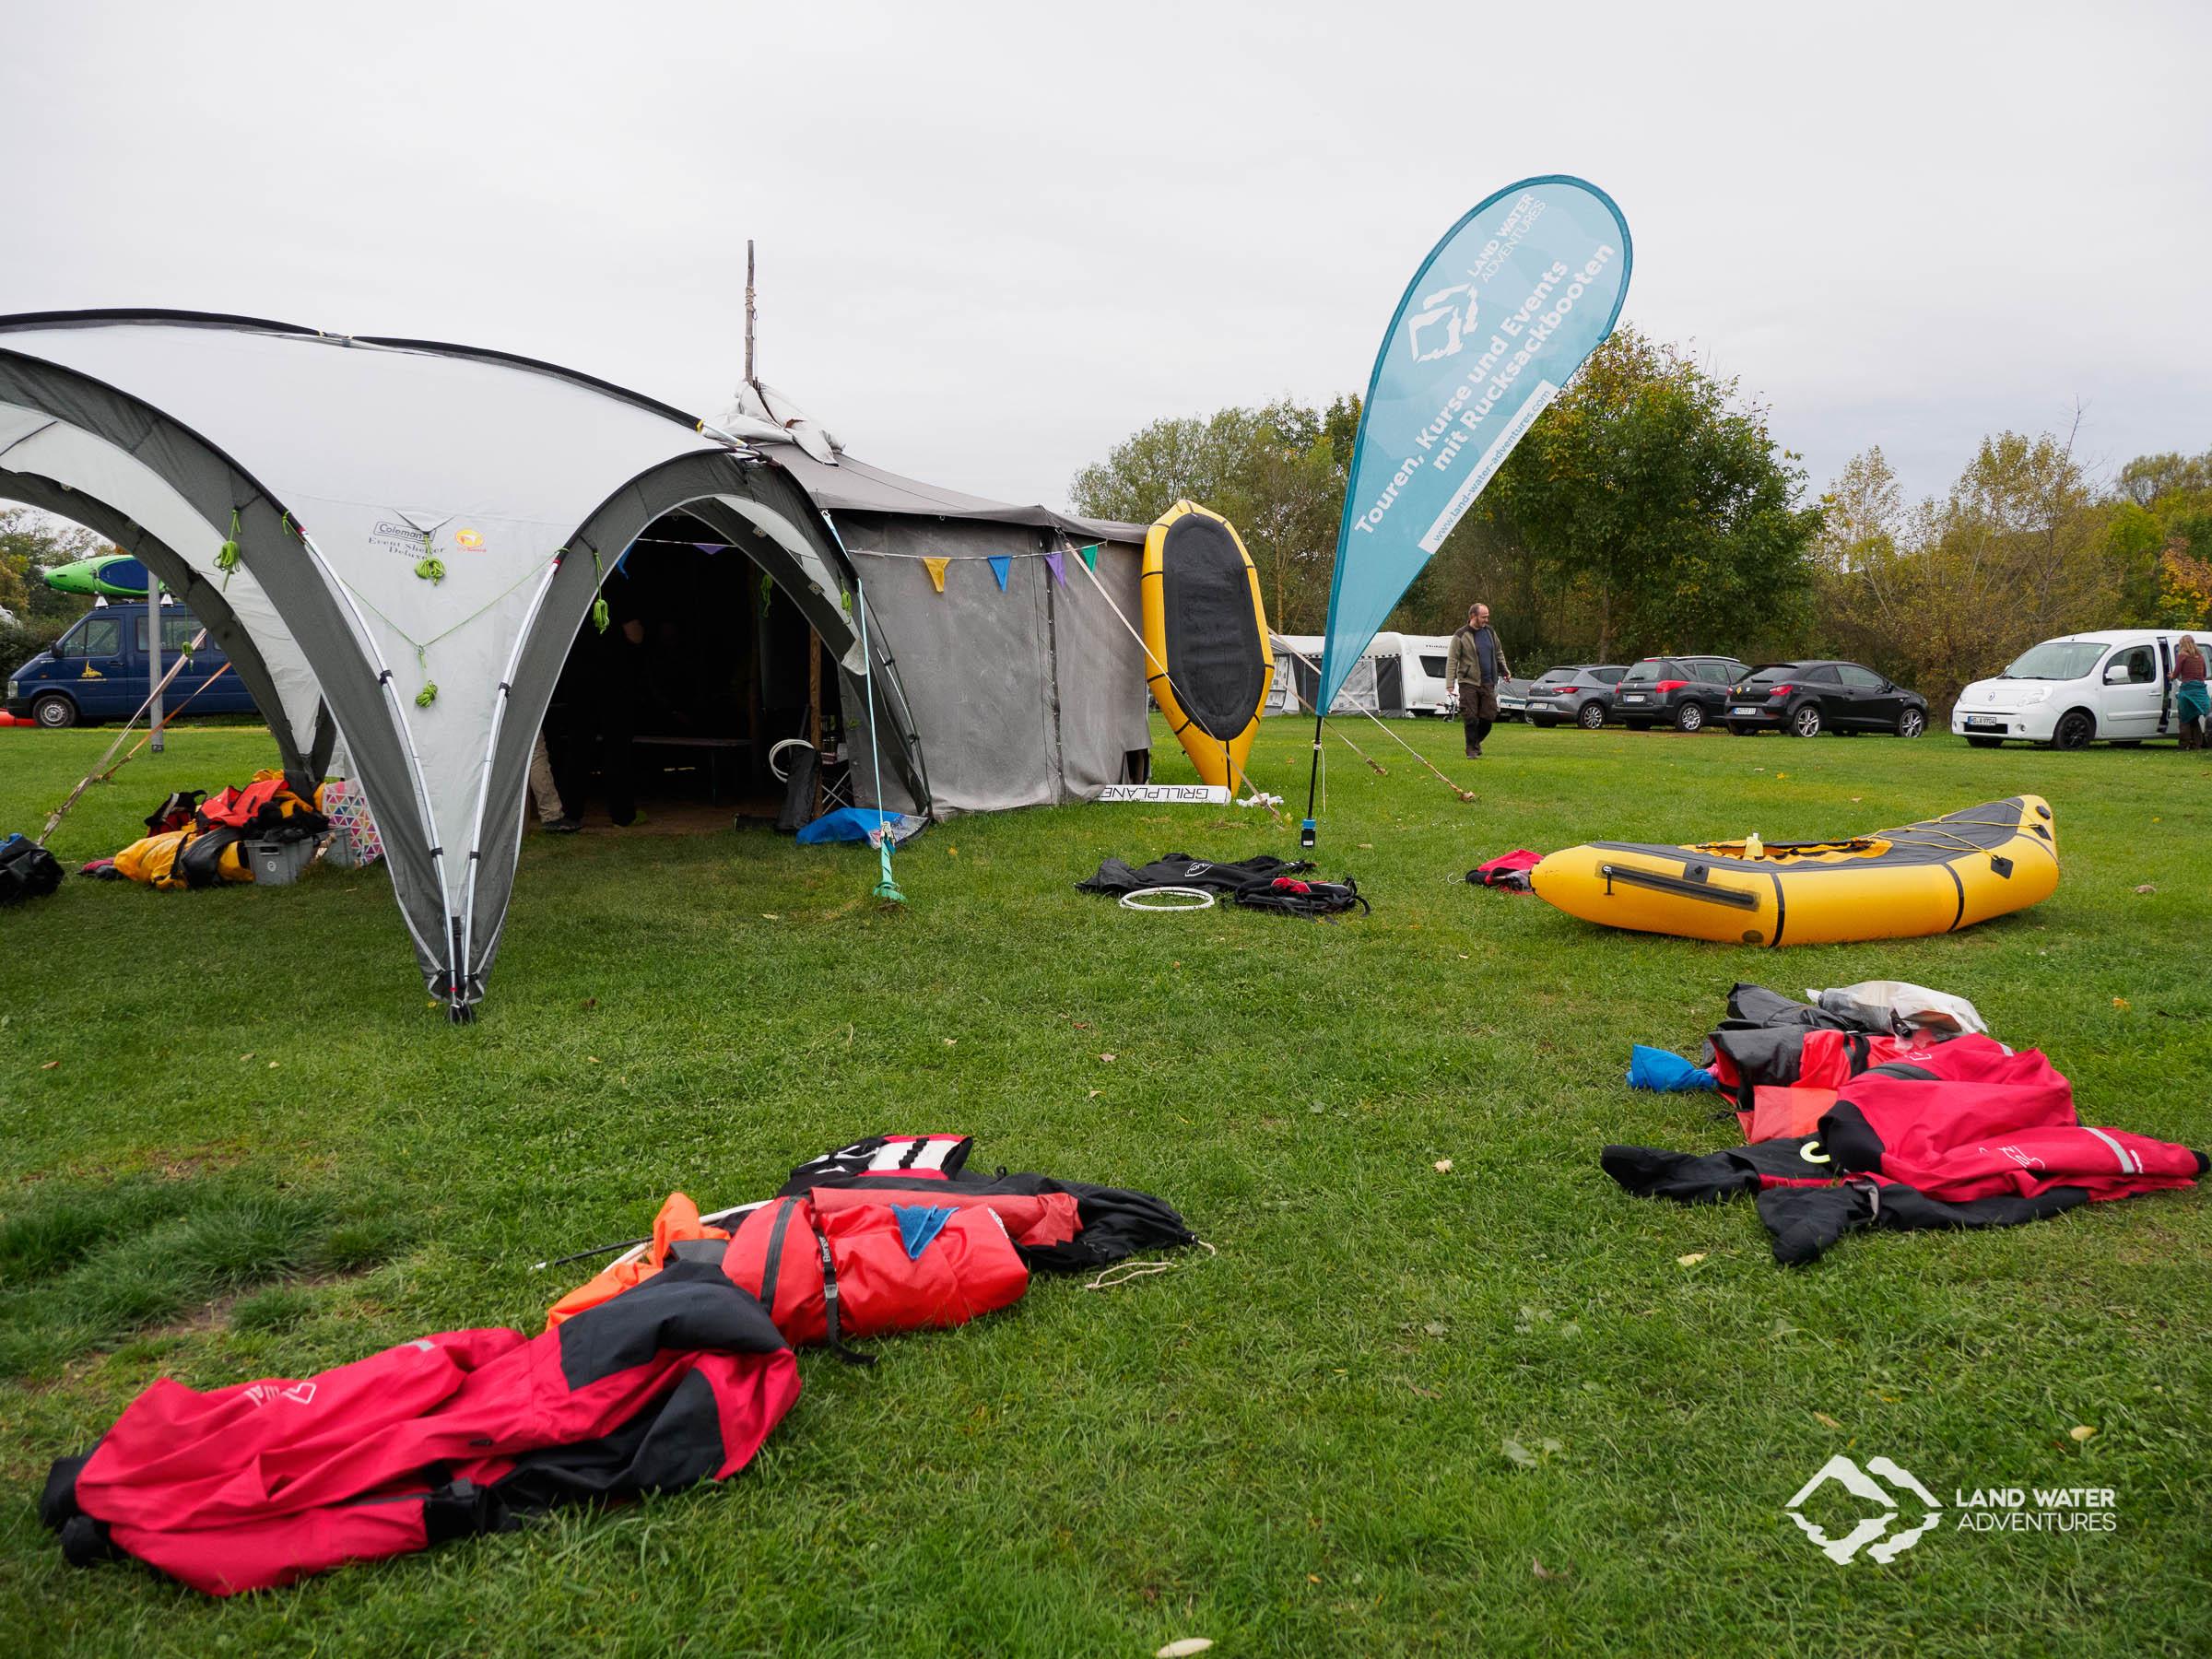 Saisonabschluss LWA Nahe 2017 am Campingplatz Nahemühle © Land Water Adventures